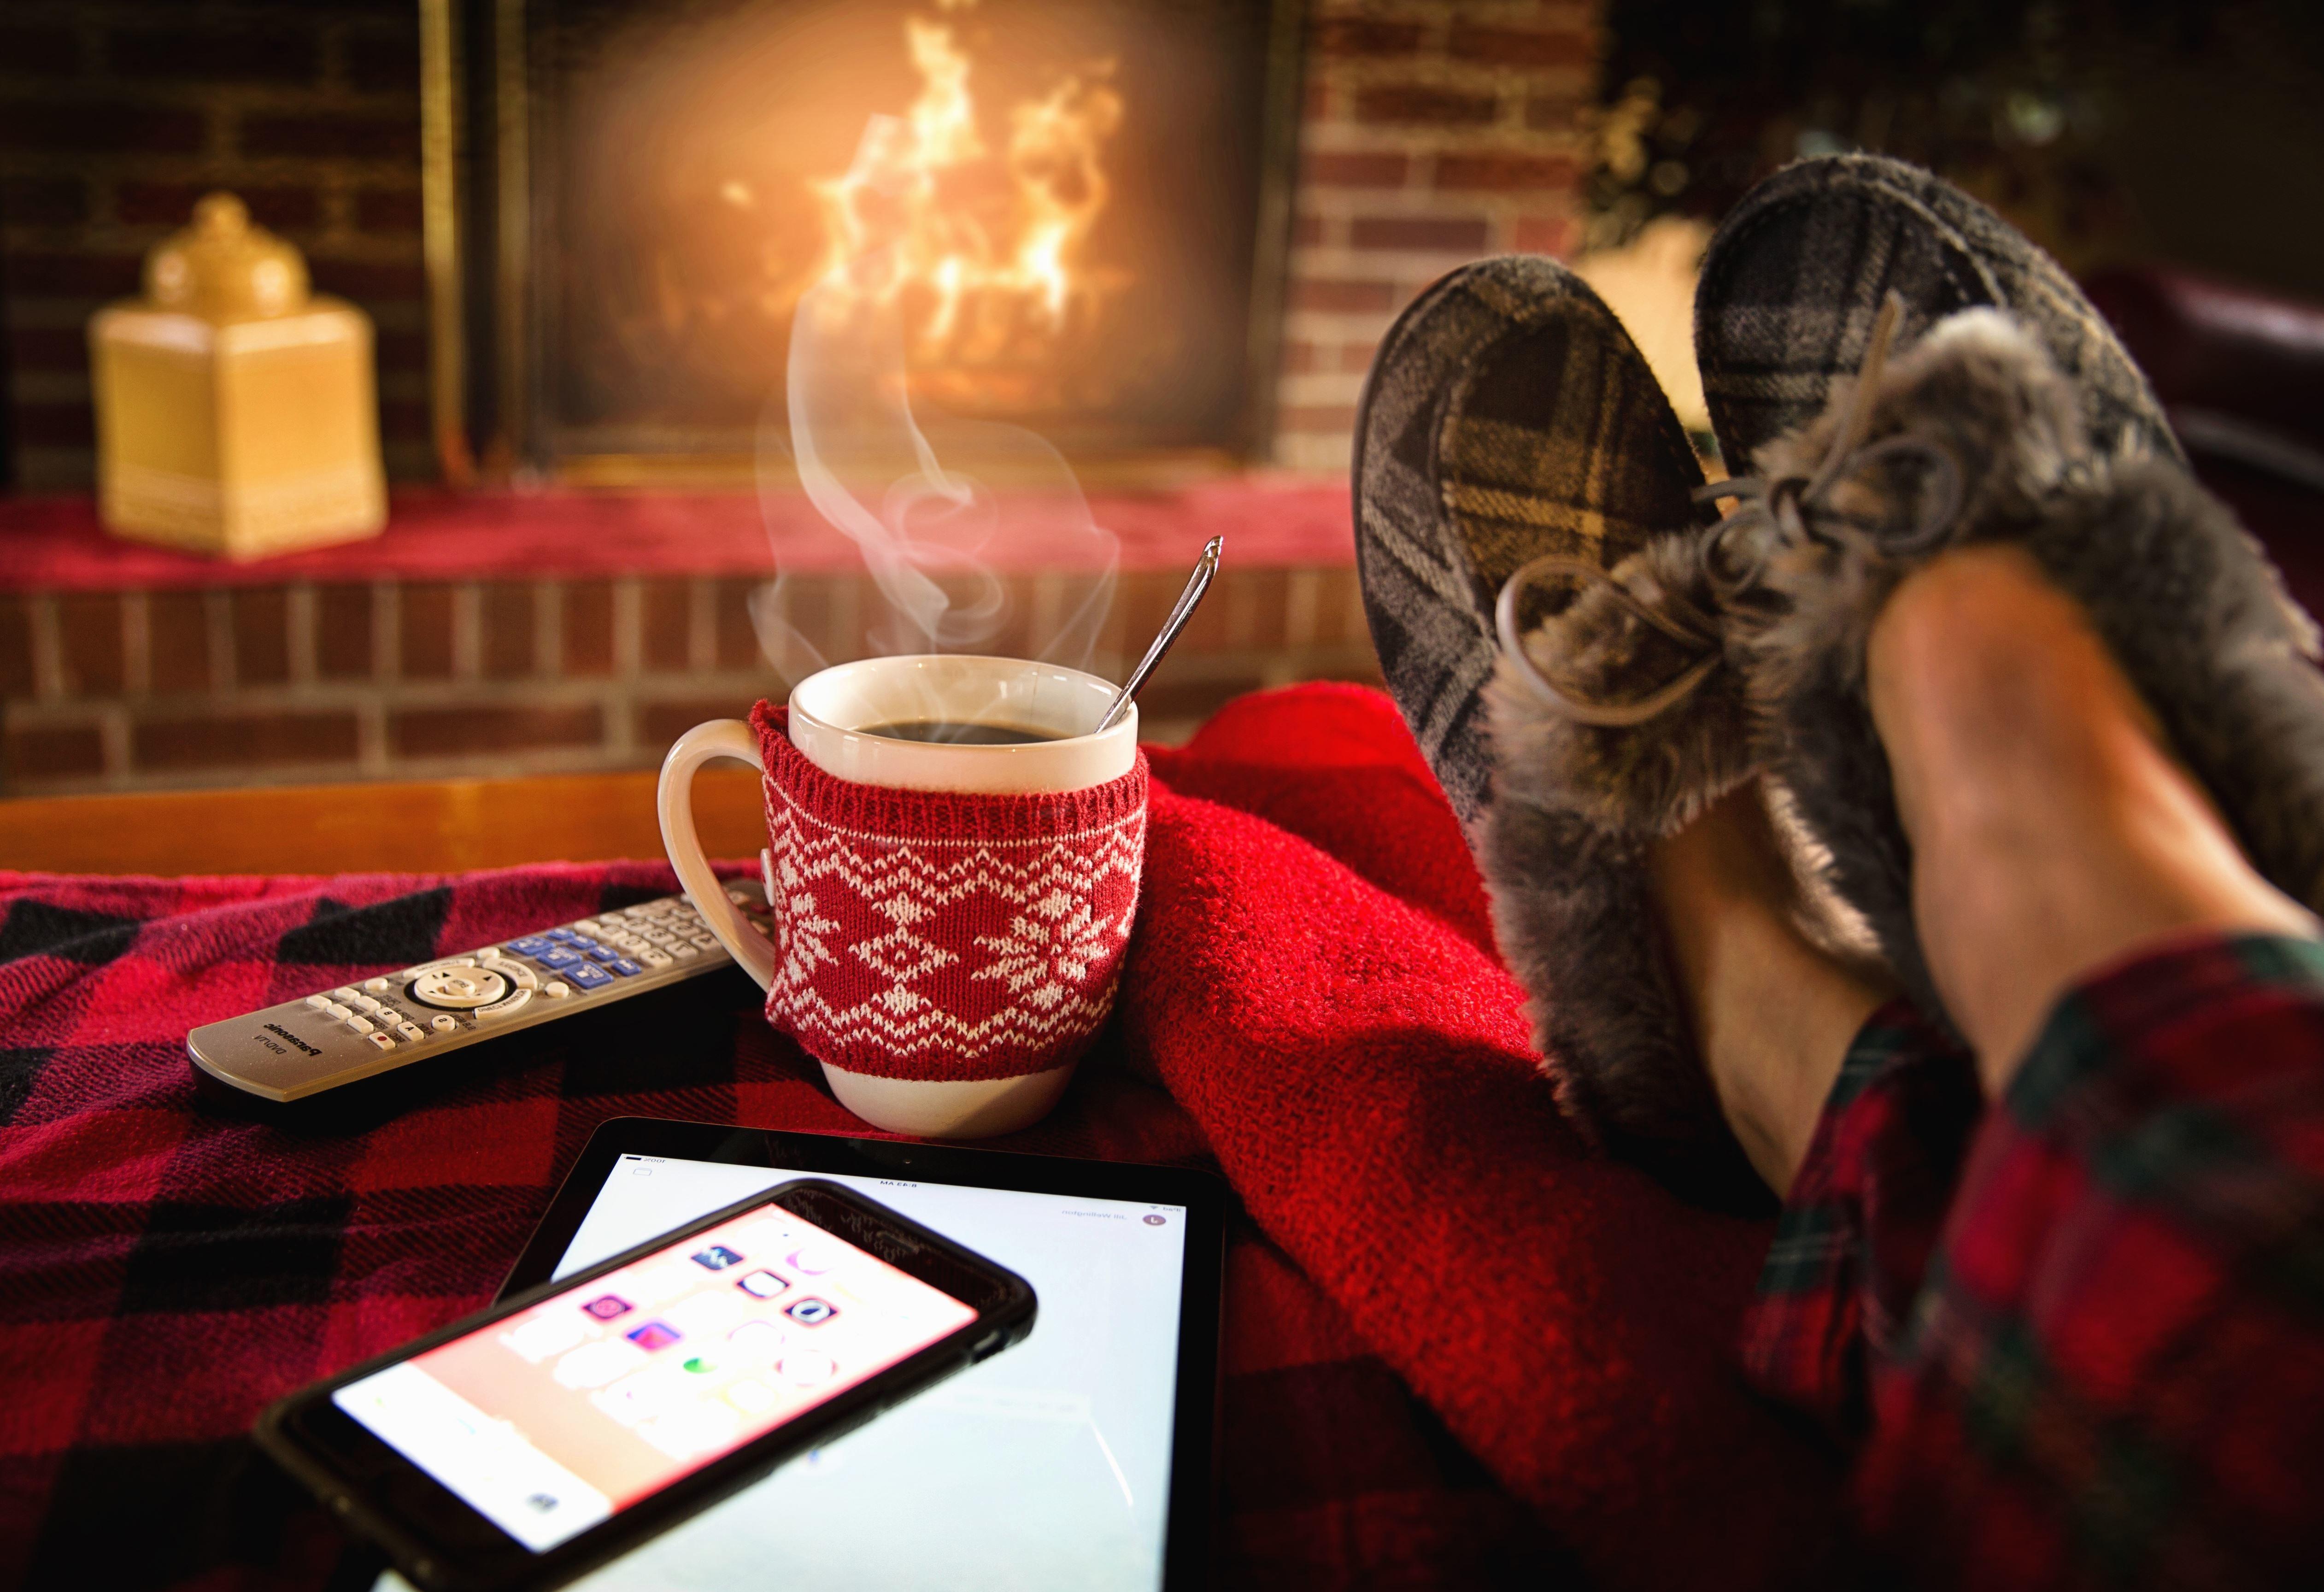 Image libre Smartphone maison chemine flamme nourriture boisson fte tasse  caf